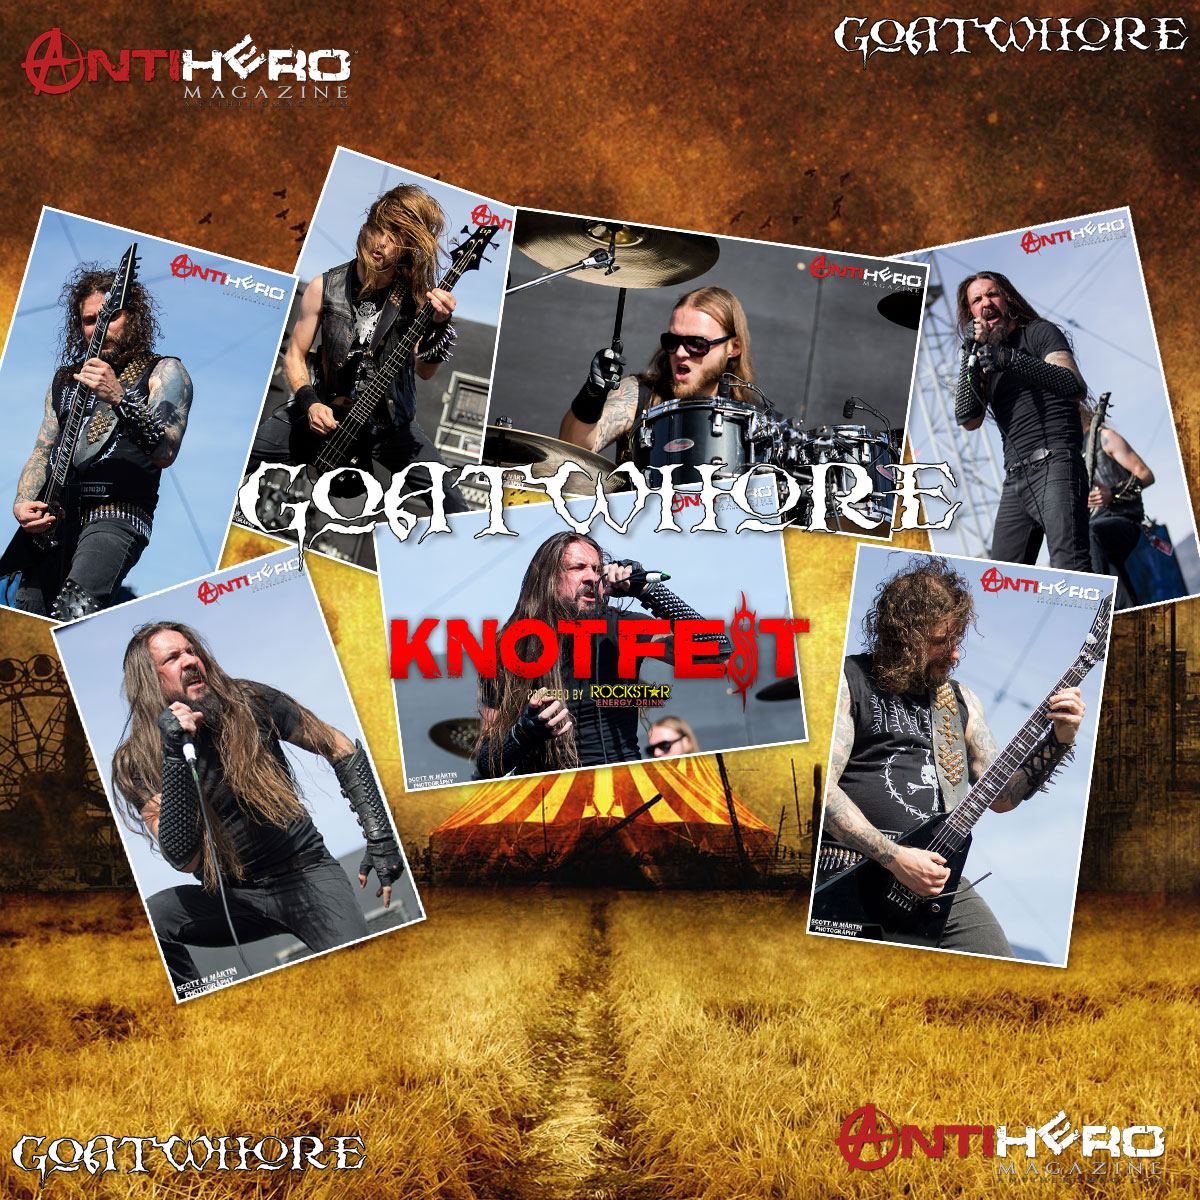 knotfest-goatwhore-cover